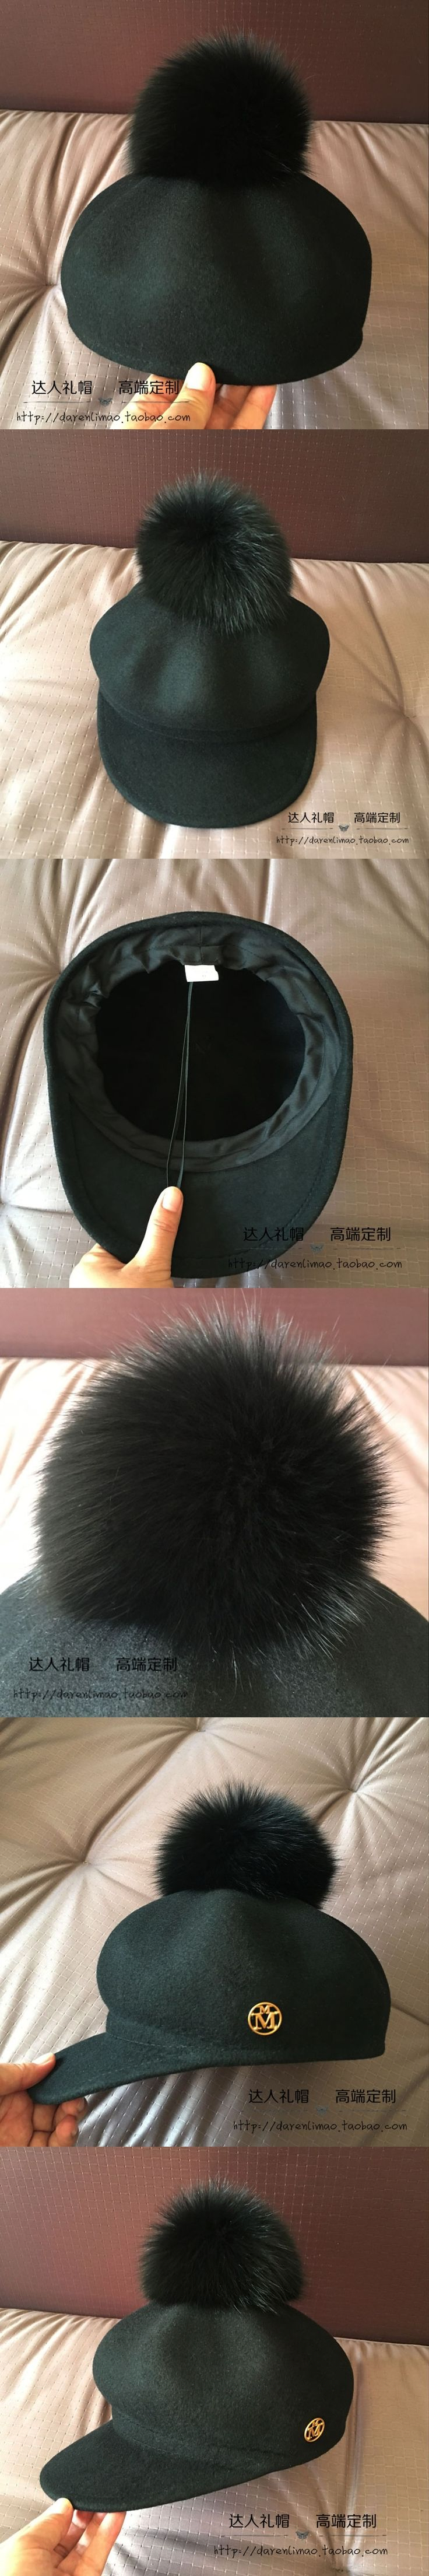 Han edition removable really fox hair bulb octagonal cap wool double gold metal logo homburg parent-child model